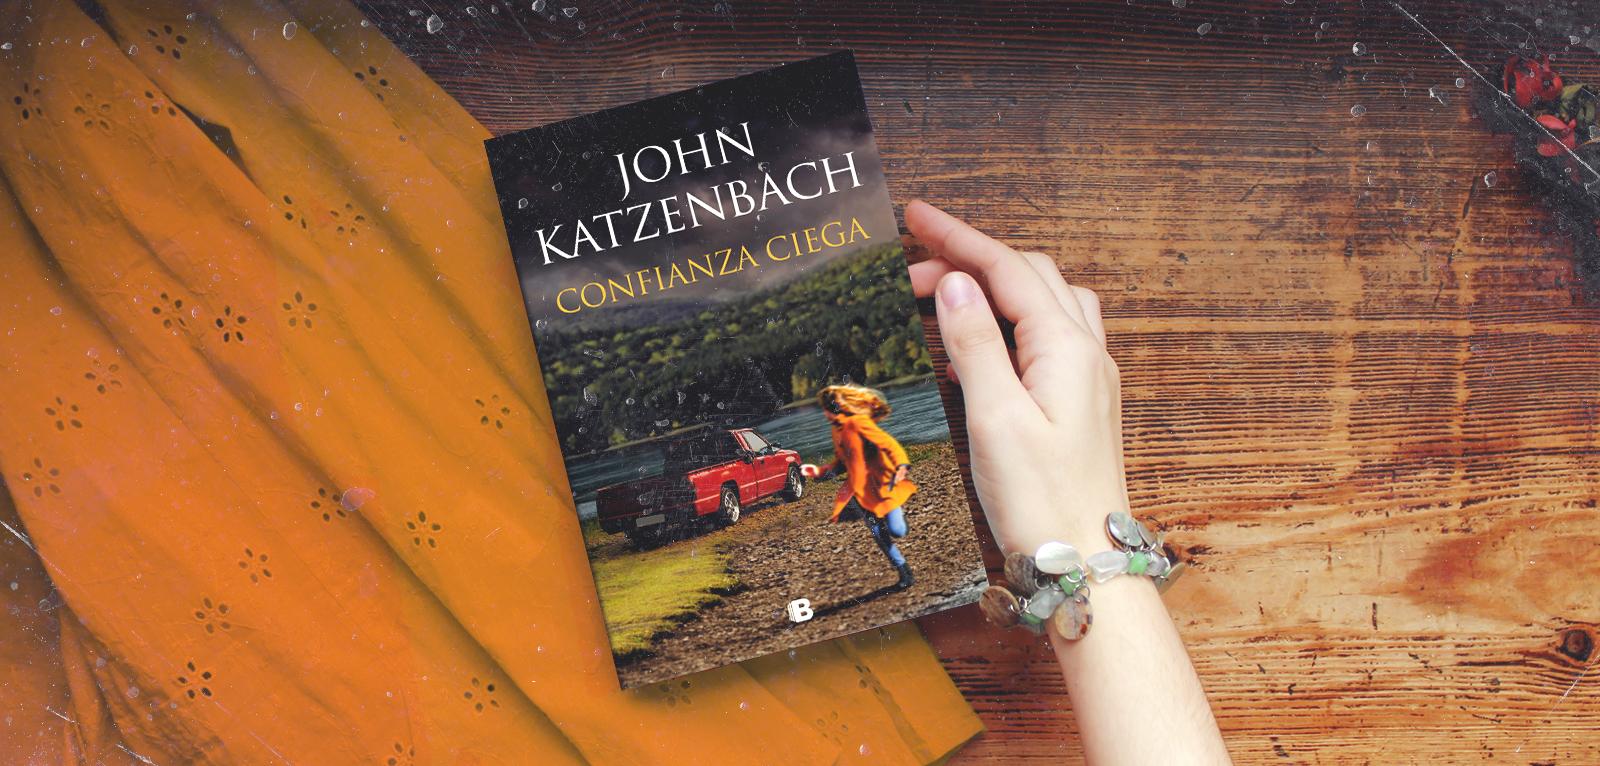 Confianza ciega · John Katzenbach